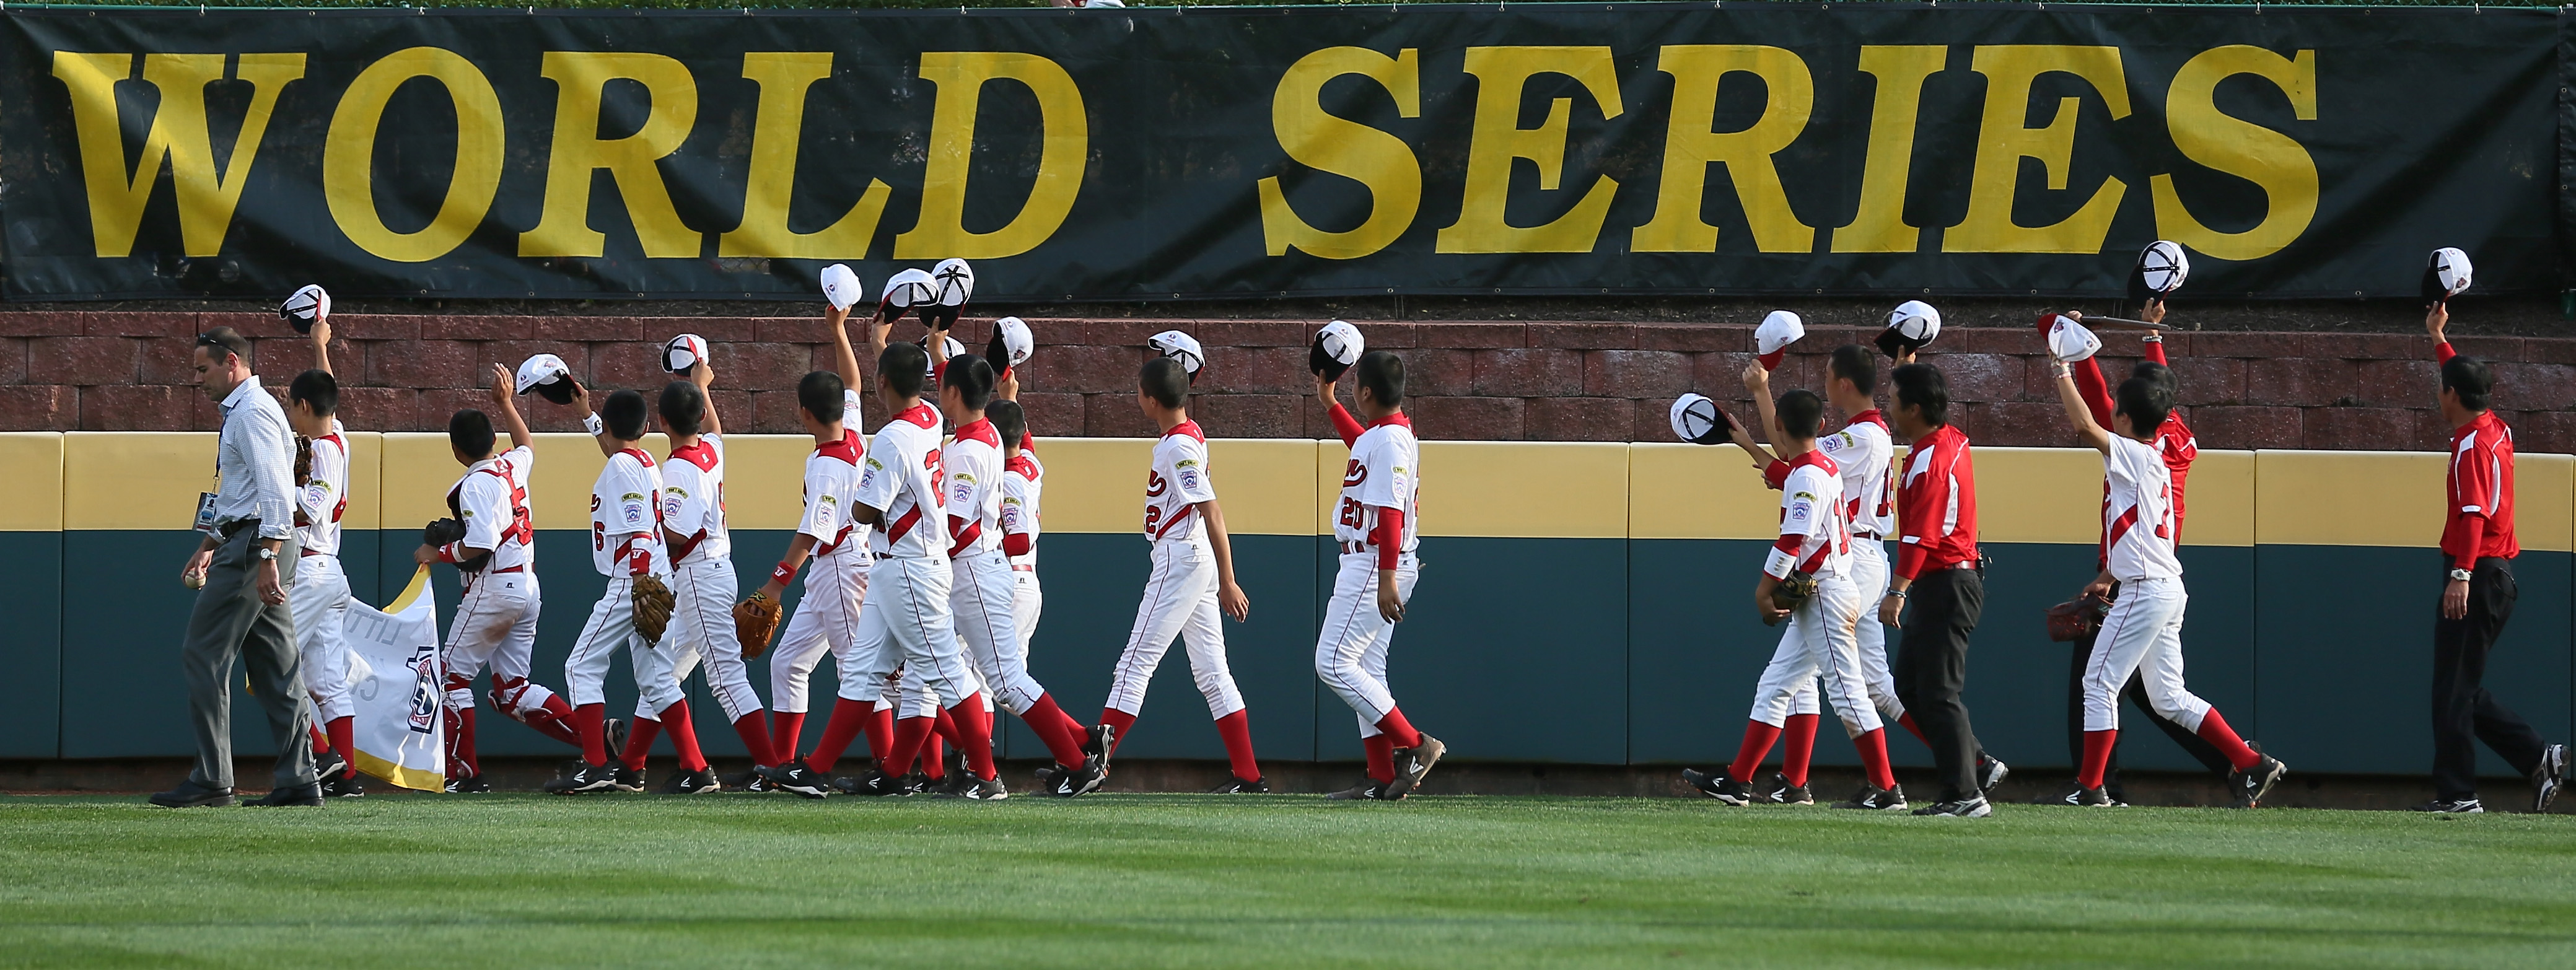 Little League World Series - World Series Championship